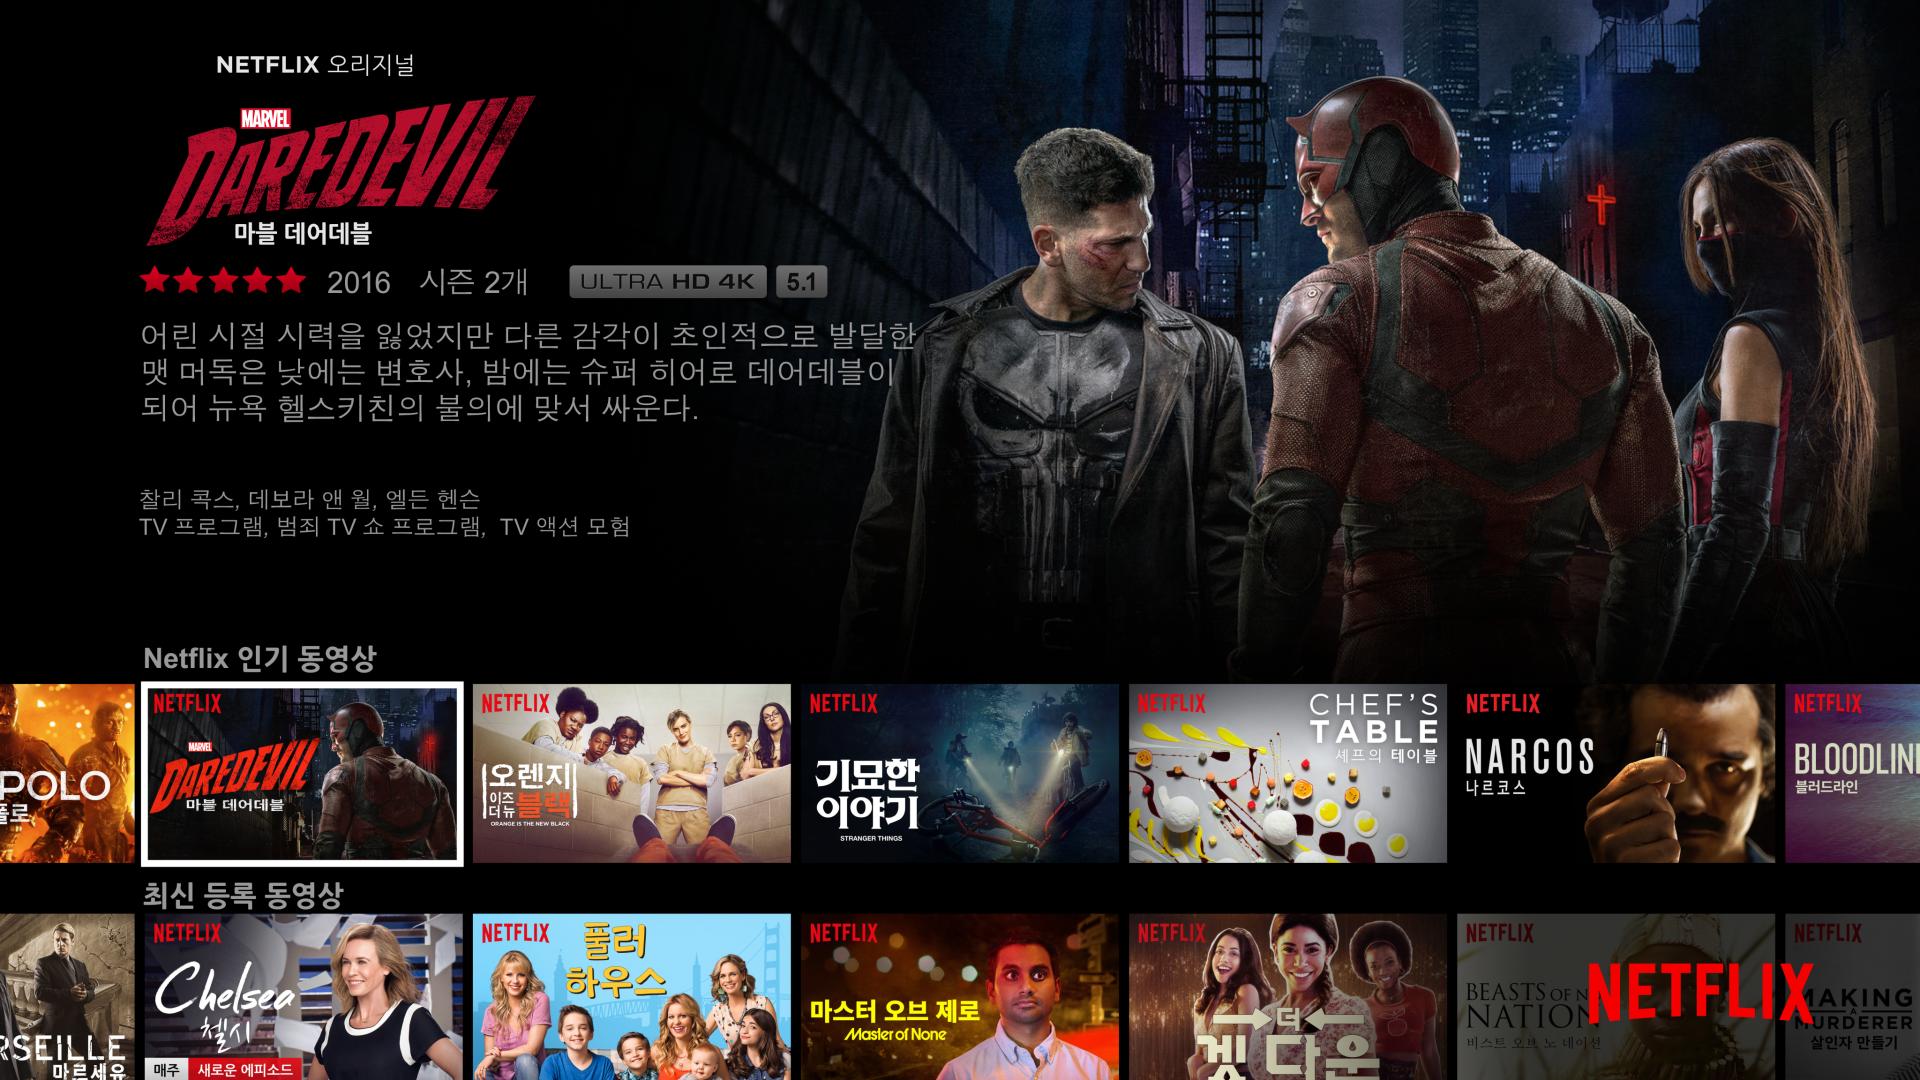 Marvel's Daredevil shown on Netflix home screen in Korean.